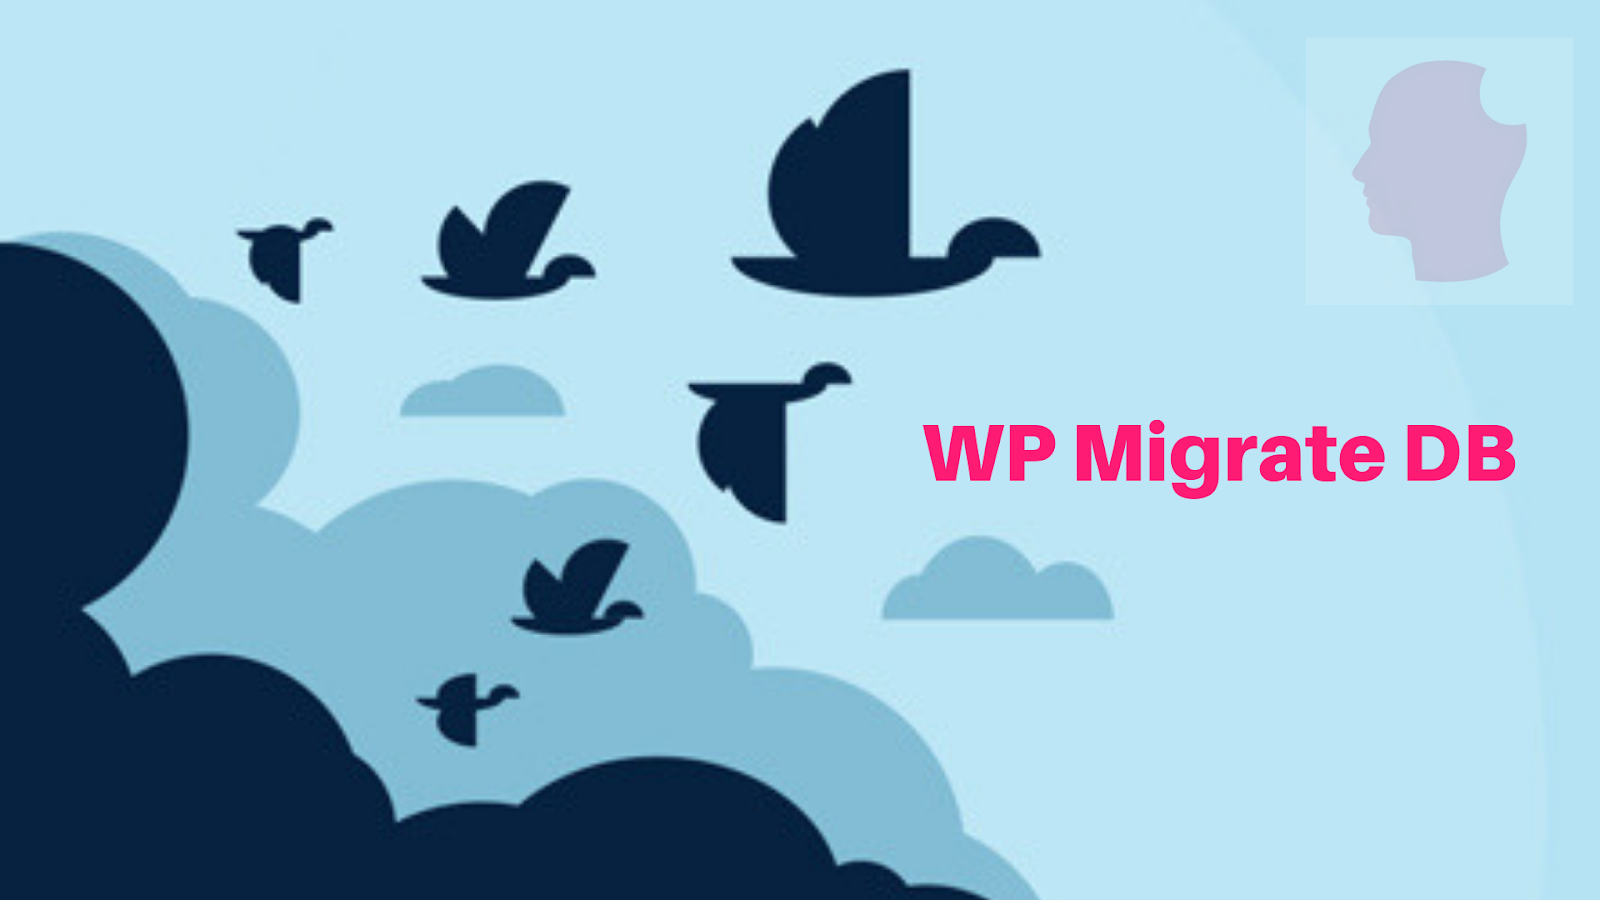 WP Migrate DB - wordpress migration plugins